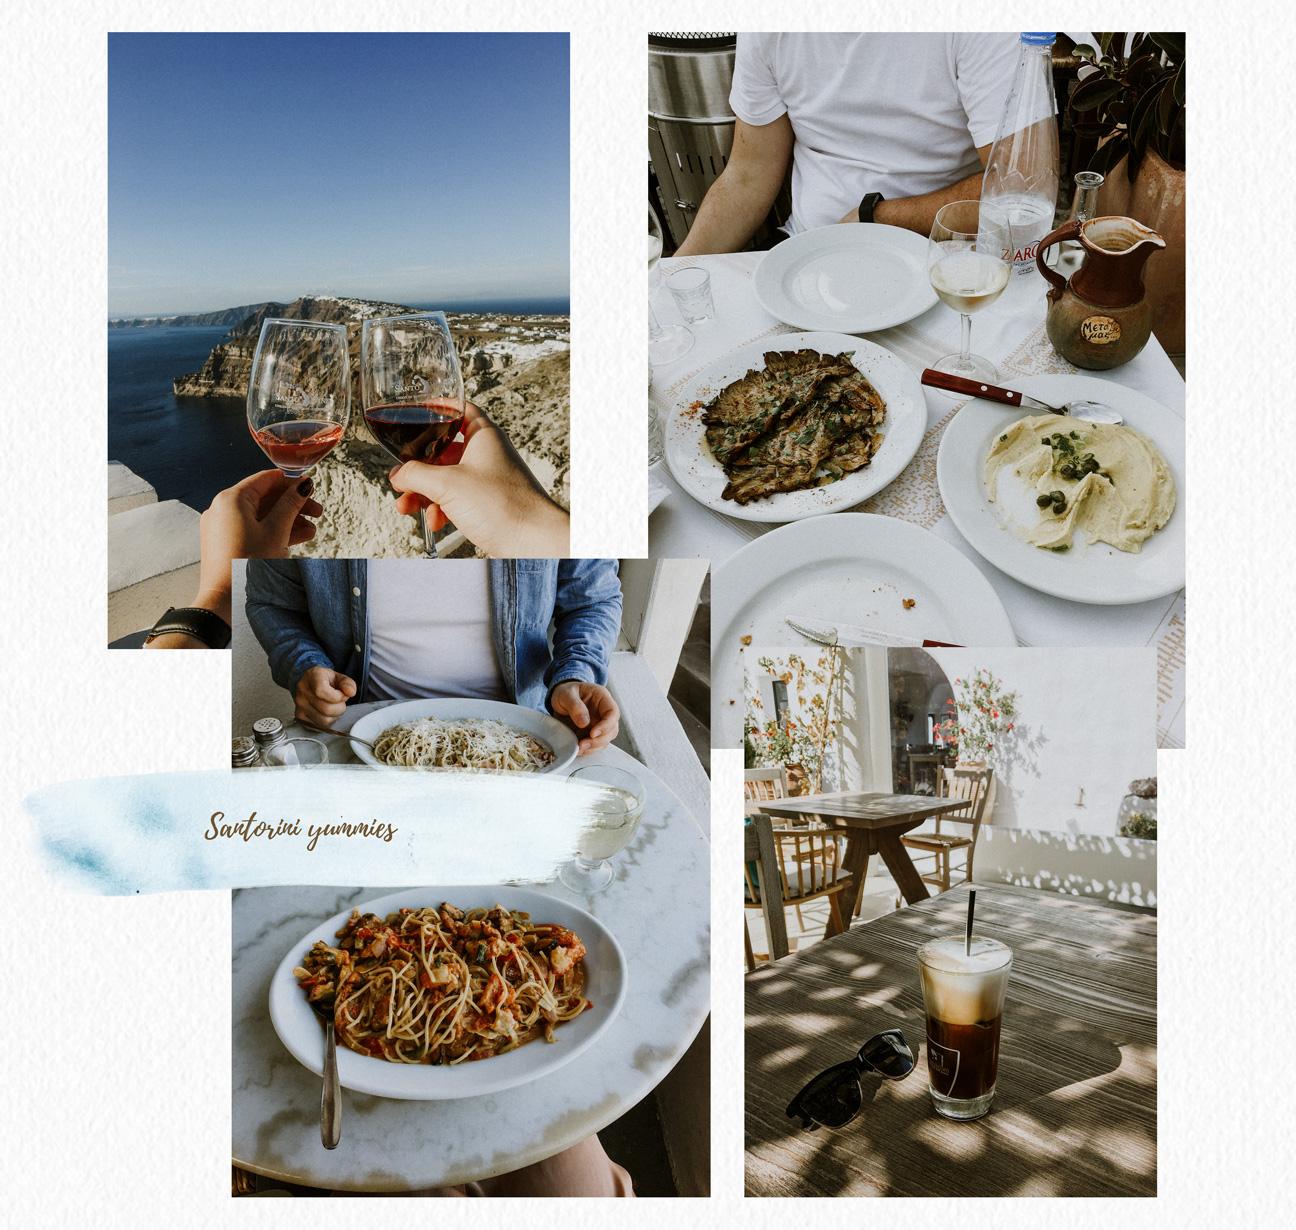 Santorini food and drinks